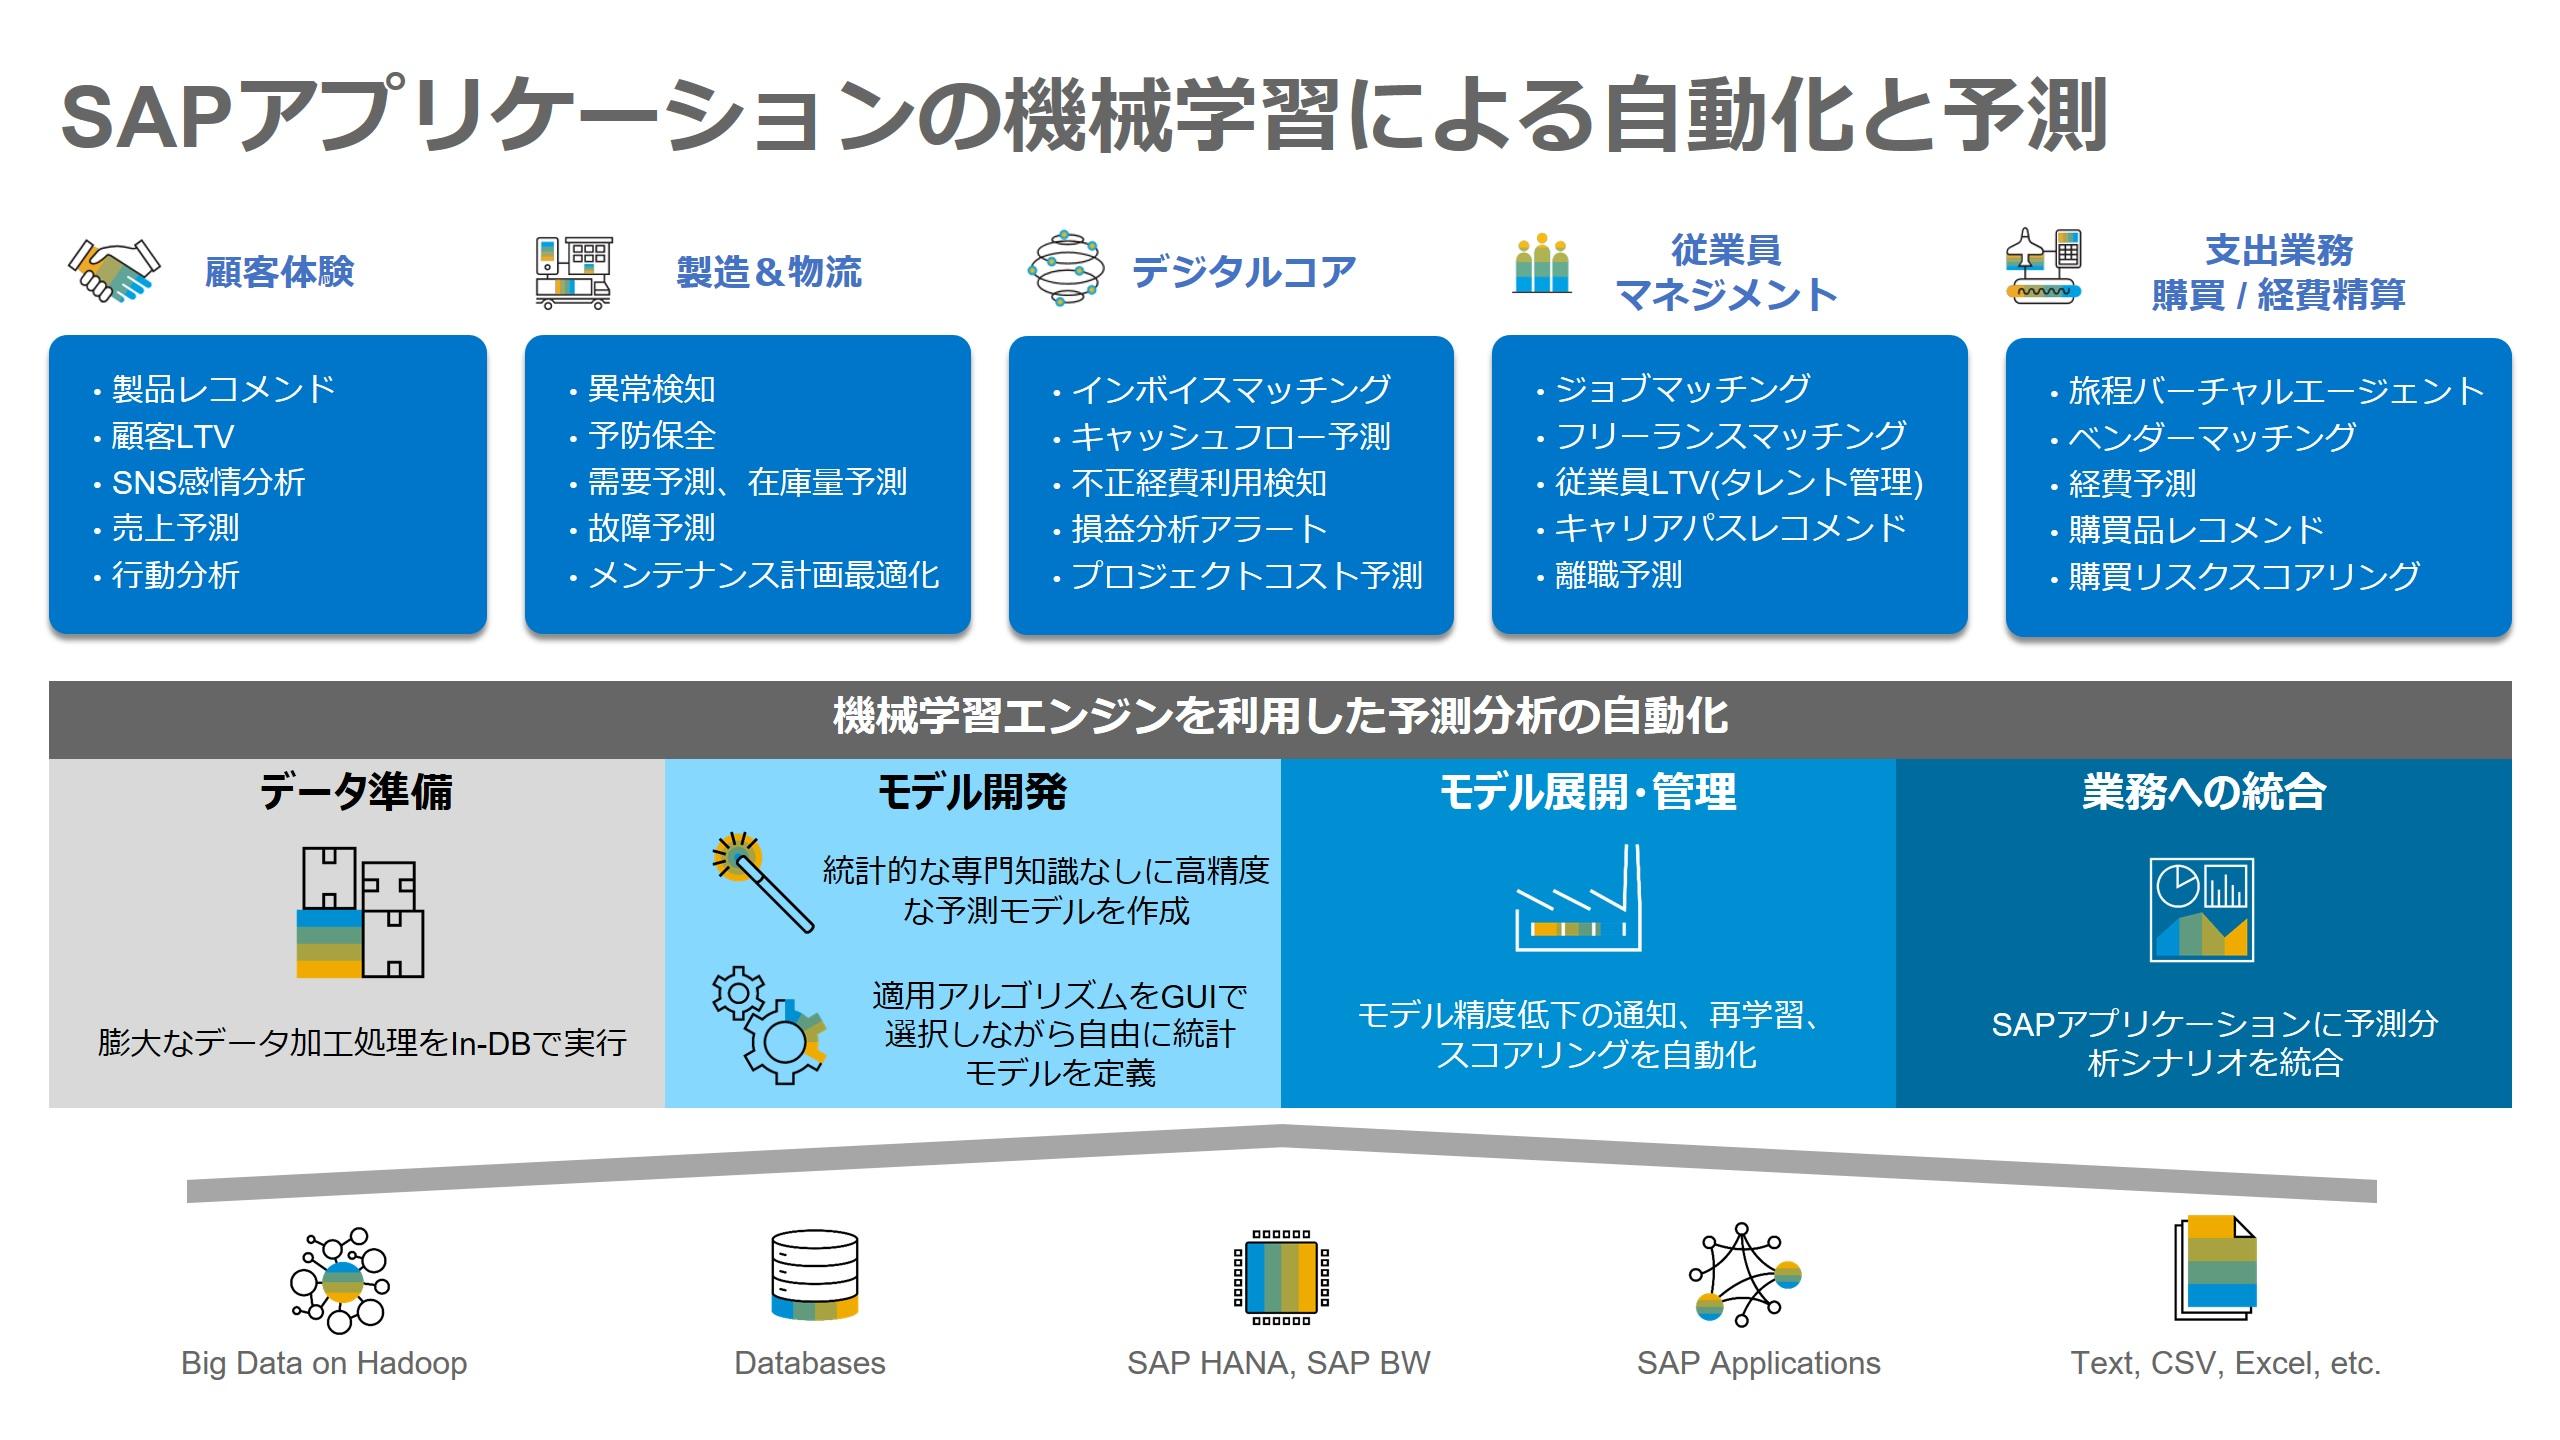 SAPアプリケーションの機械学習適用範囲